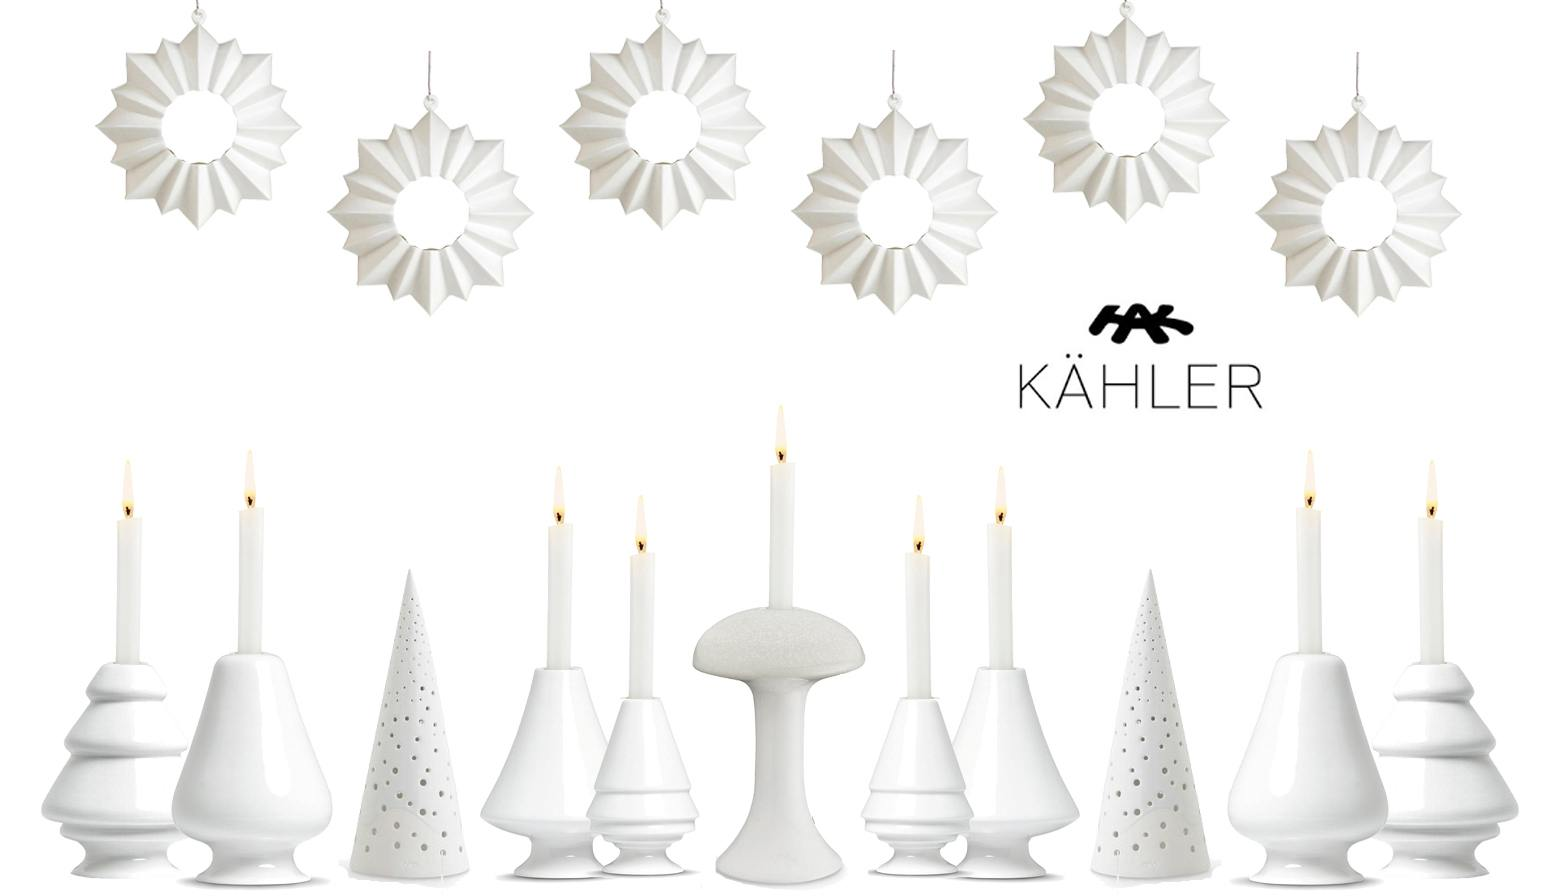 kaehler design stella avvento ahlmann wunderschoen-gemacht